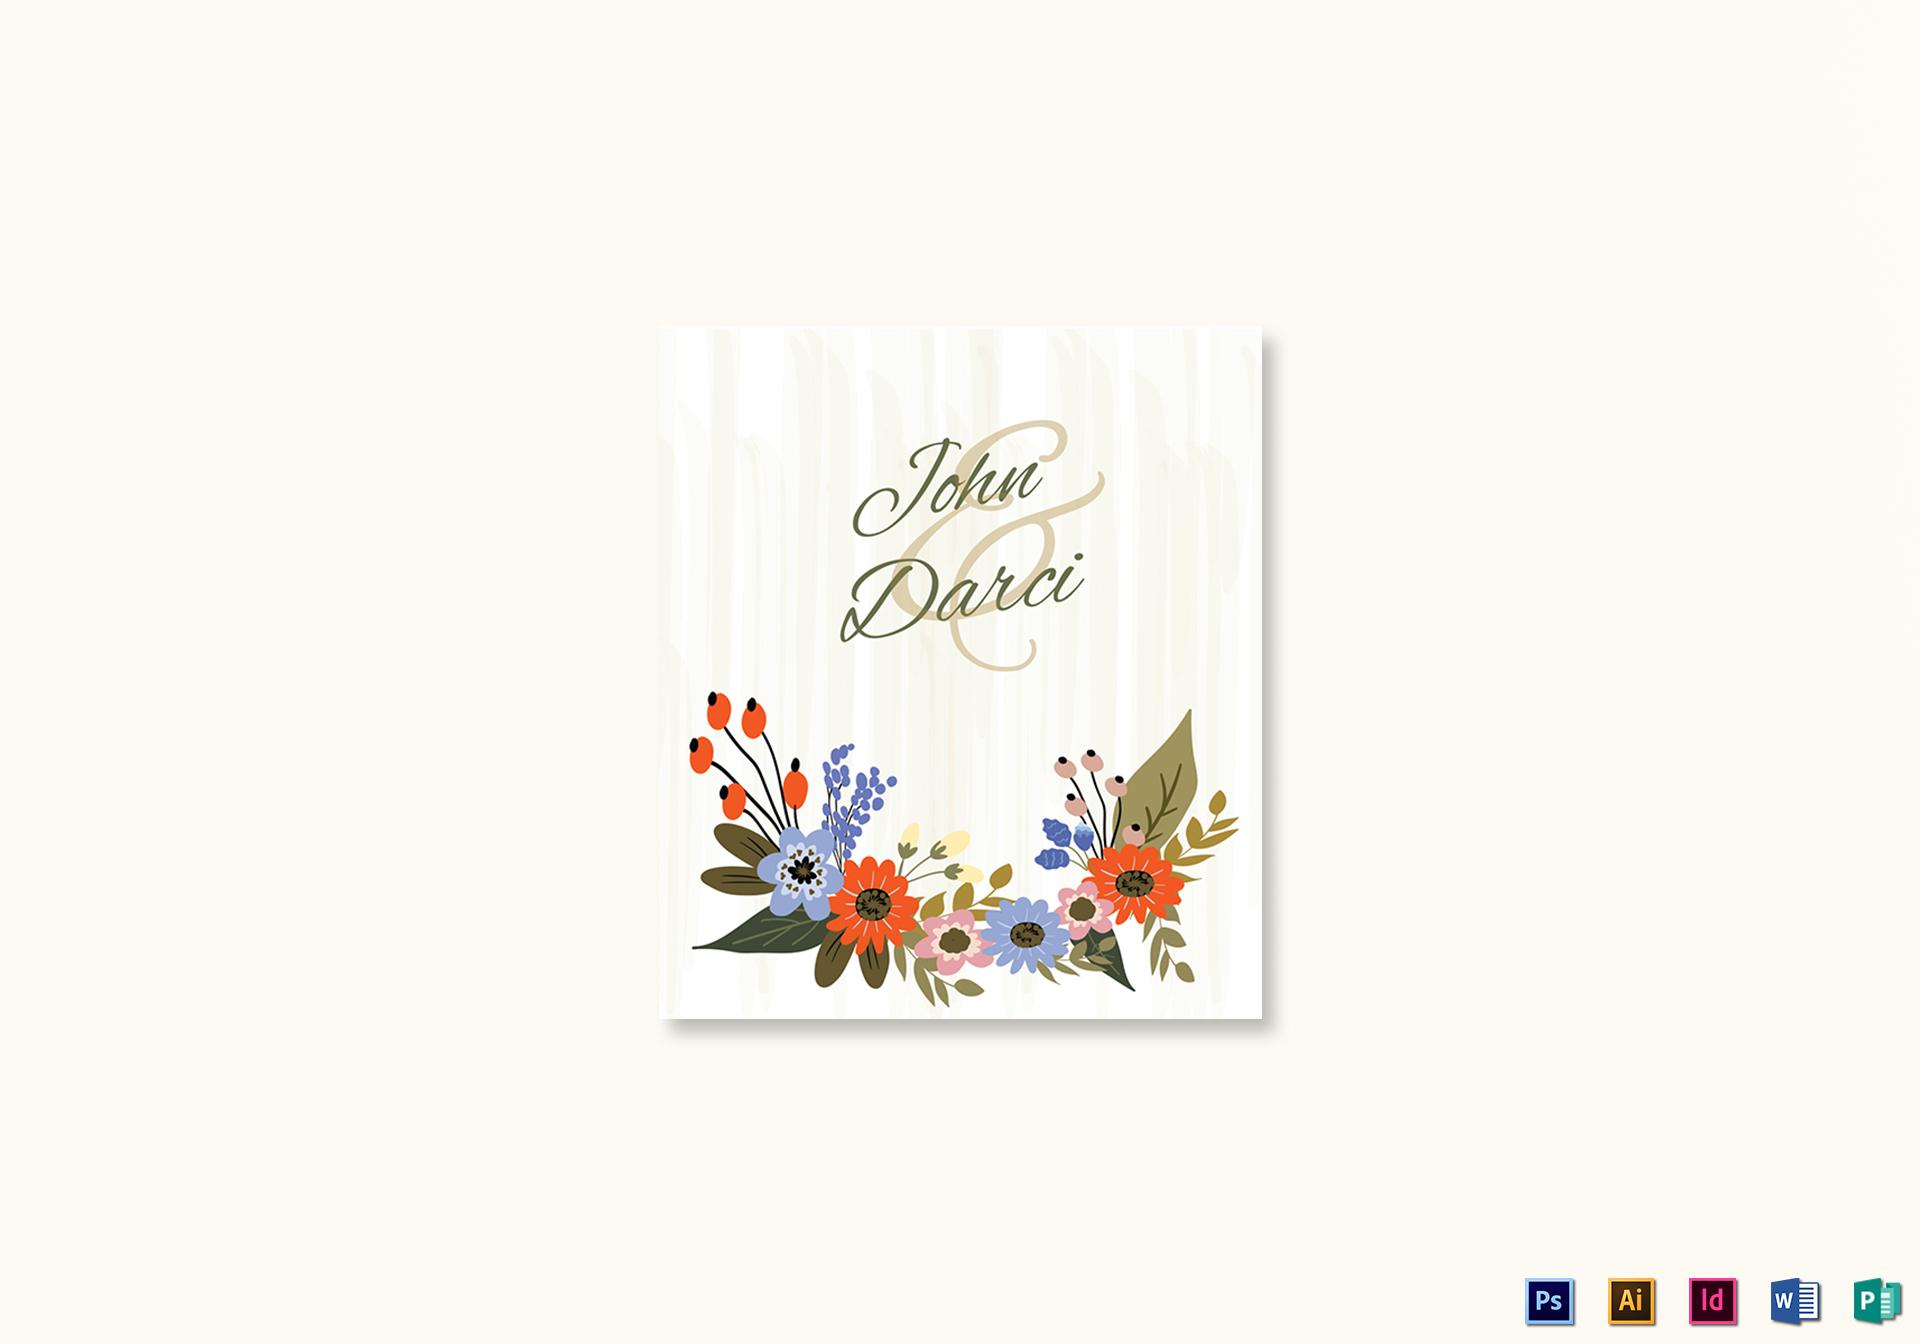 Summer Floral Wedding Place Card Design Template in Illustrator ...